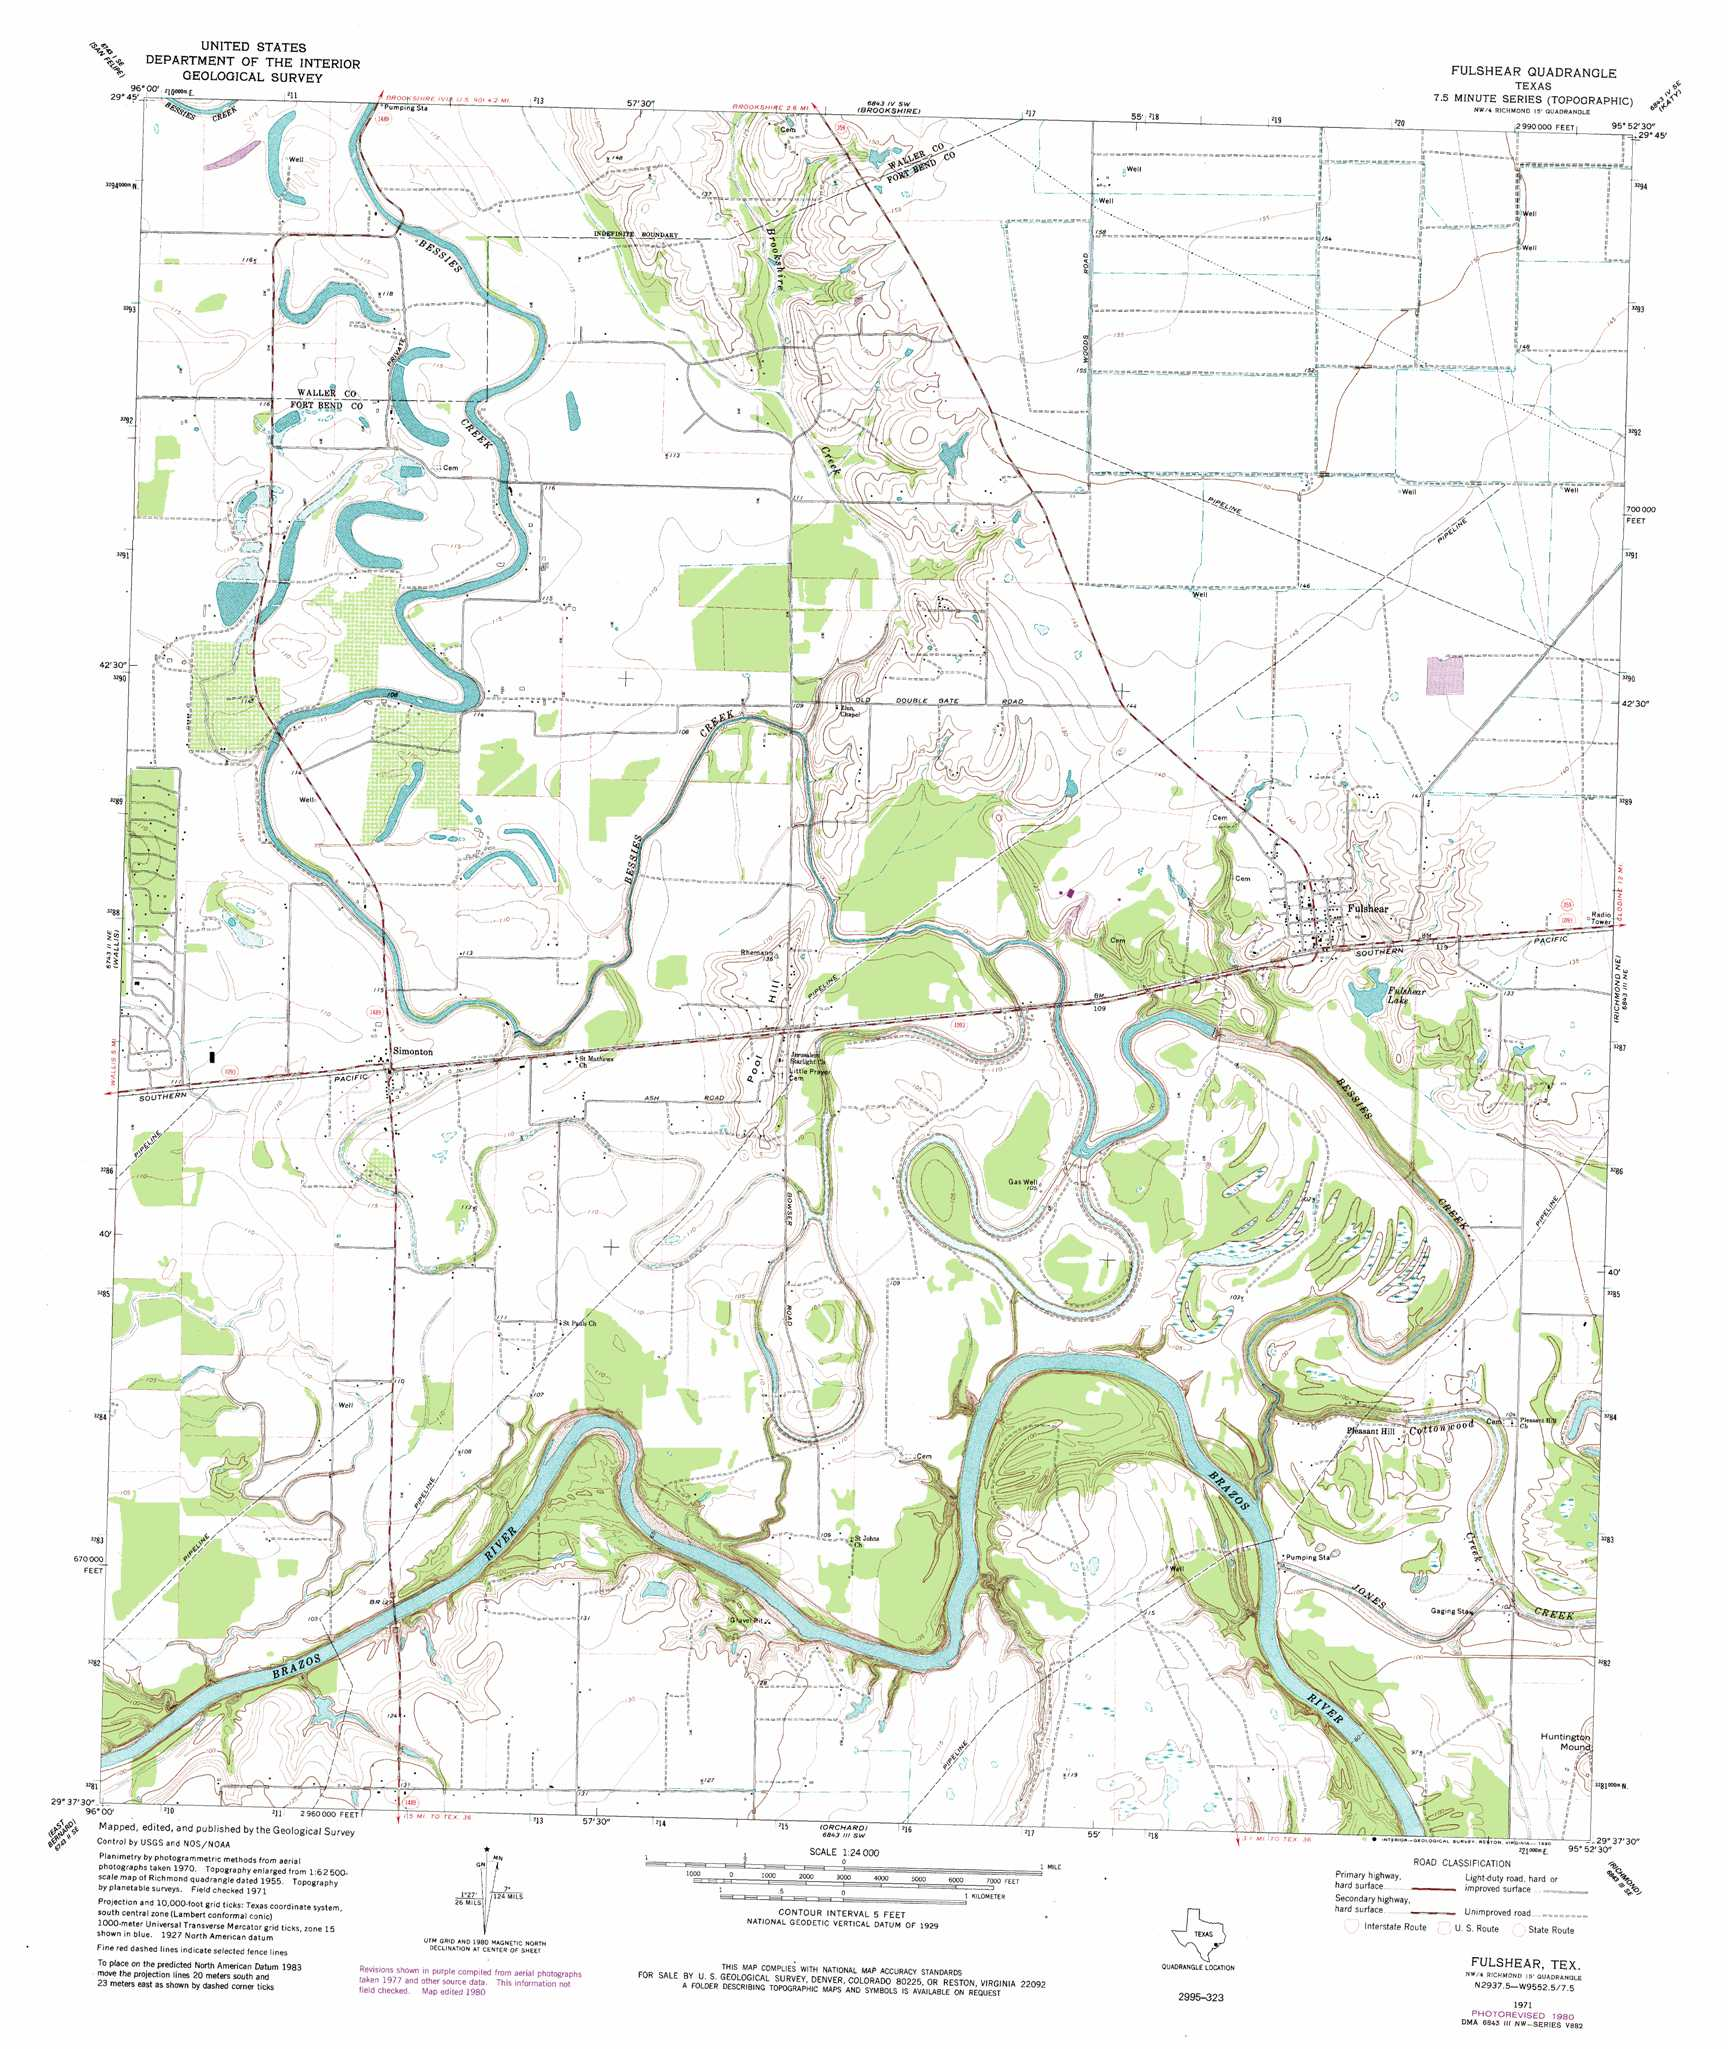 Fulshear topographic map, TX - USGS Topo Quad 29095f8